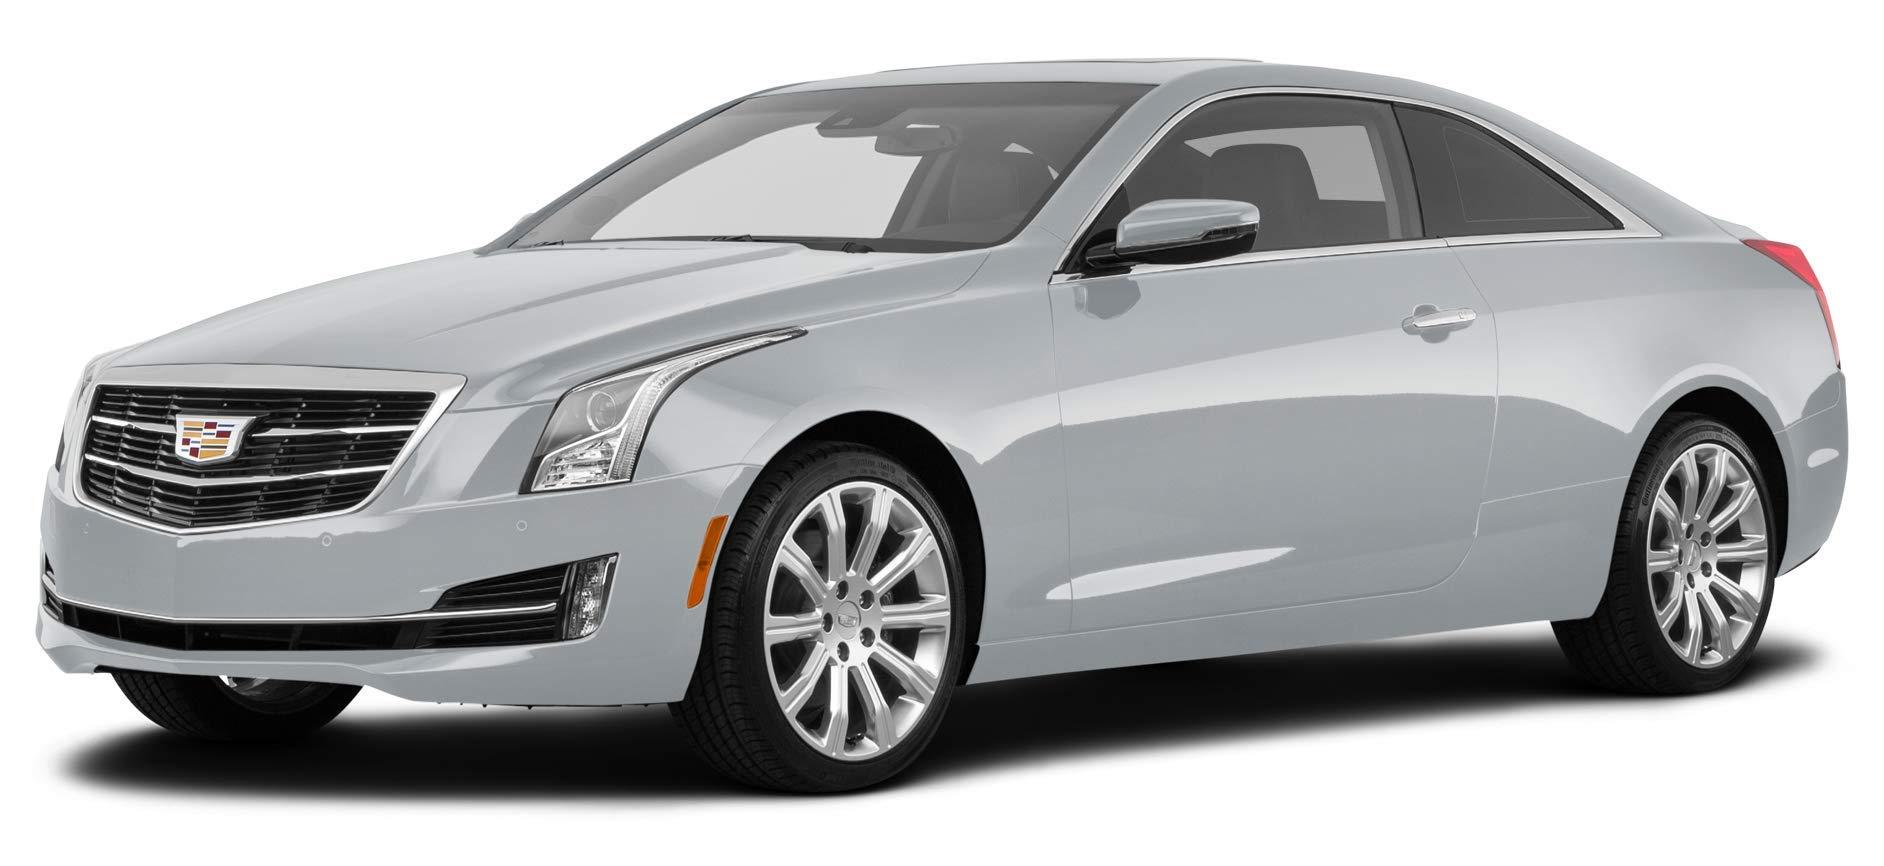 2019 Audi TT Quattro, 2.0 TFSI, 2019 Cadillac ATS Luxury All Wheel Drive, 2-Door Coupe ...